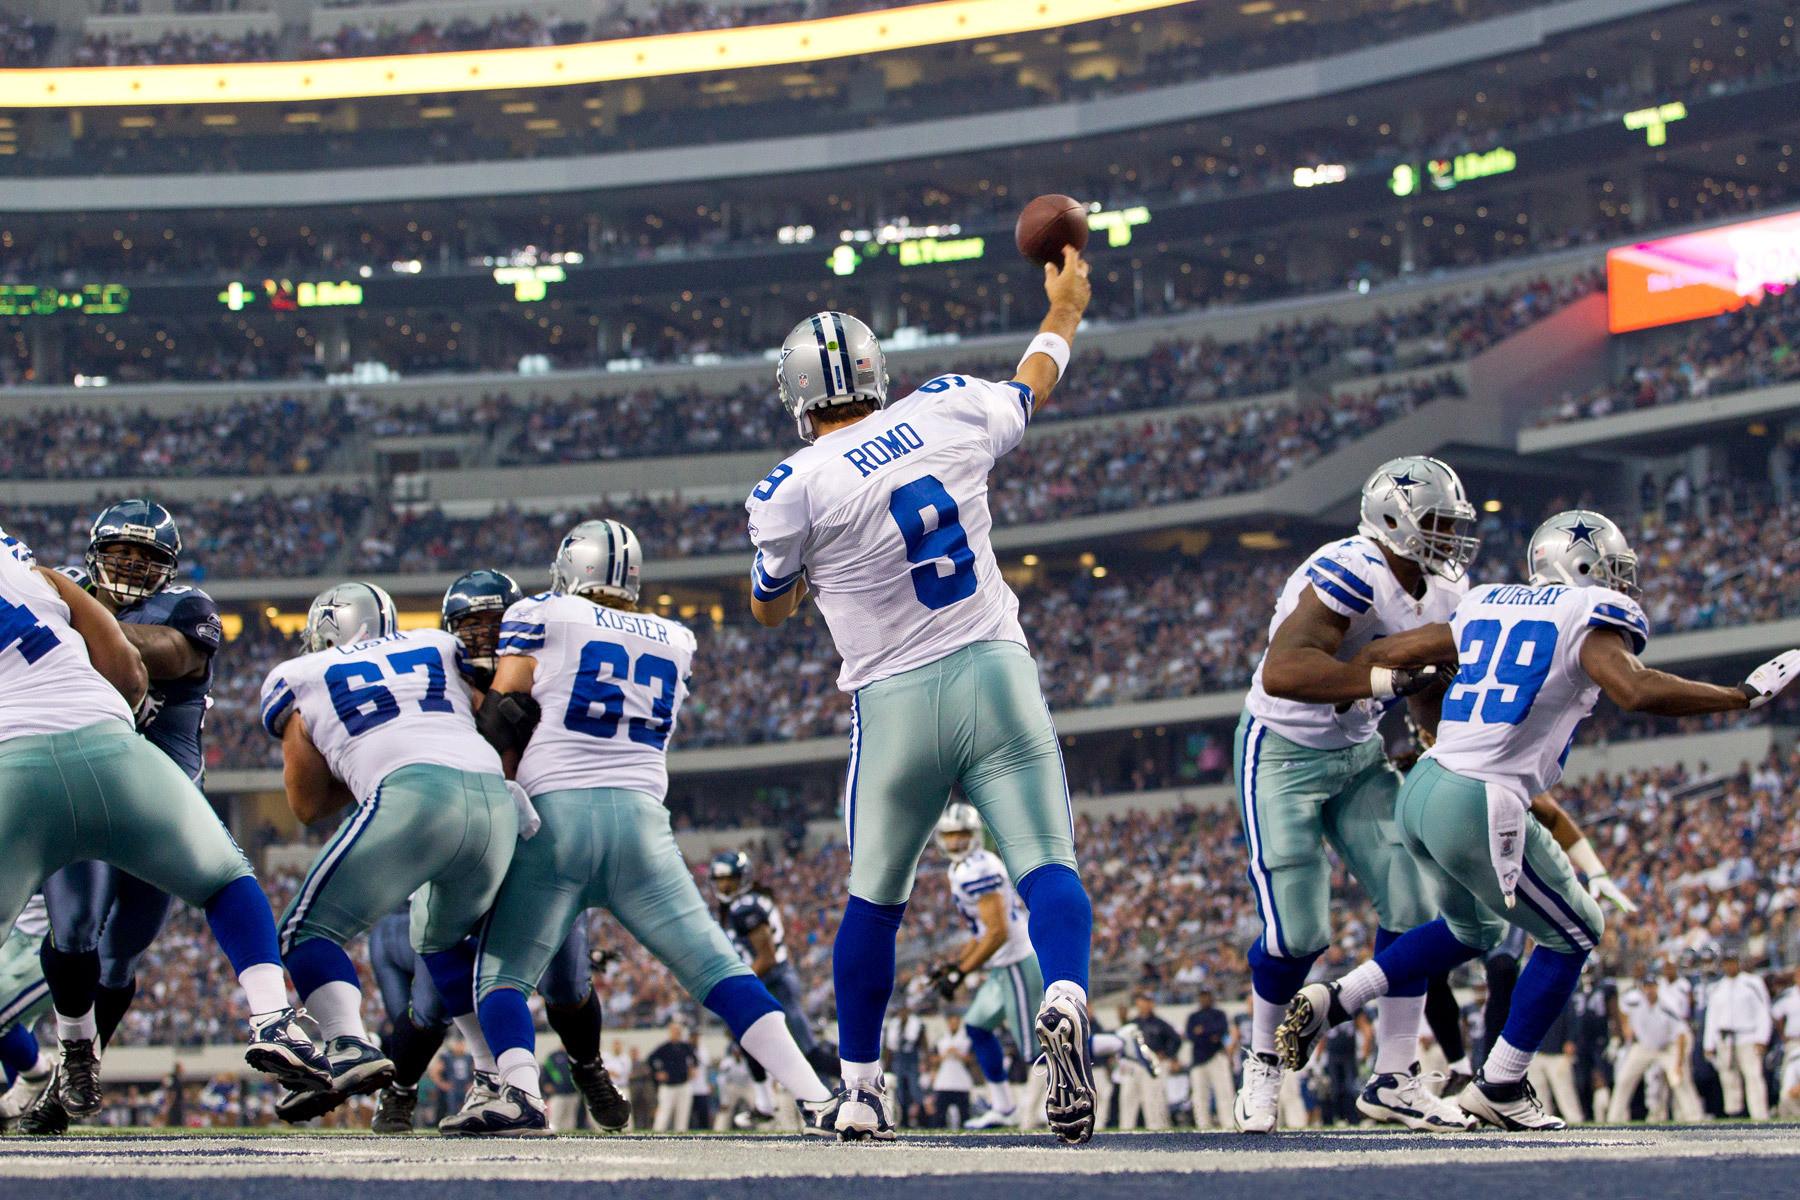 sporting events limo dallas cowboys